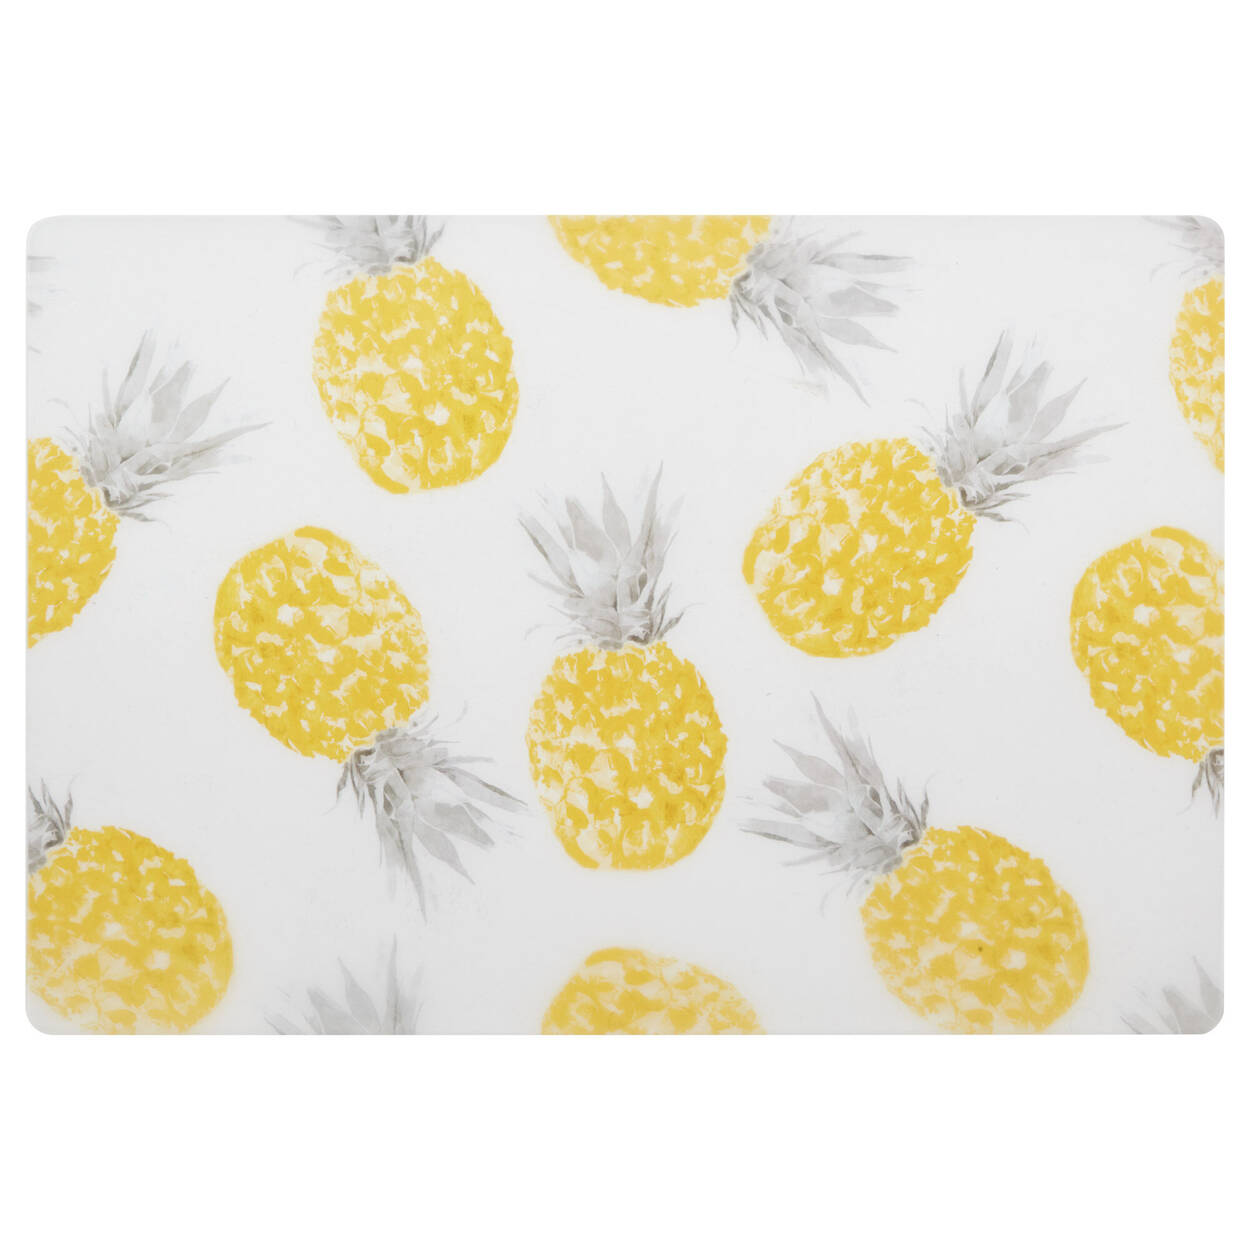 Ensemble de 4 napperons ananas en PVC